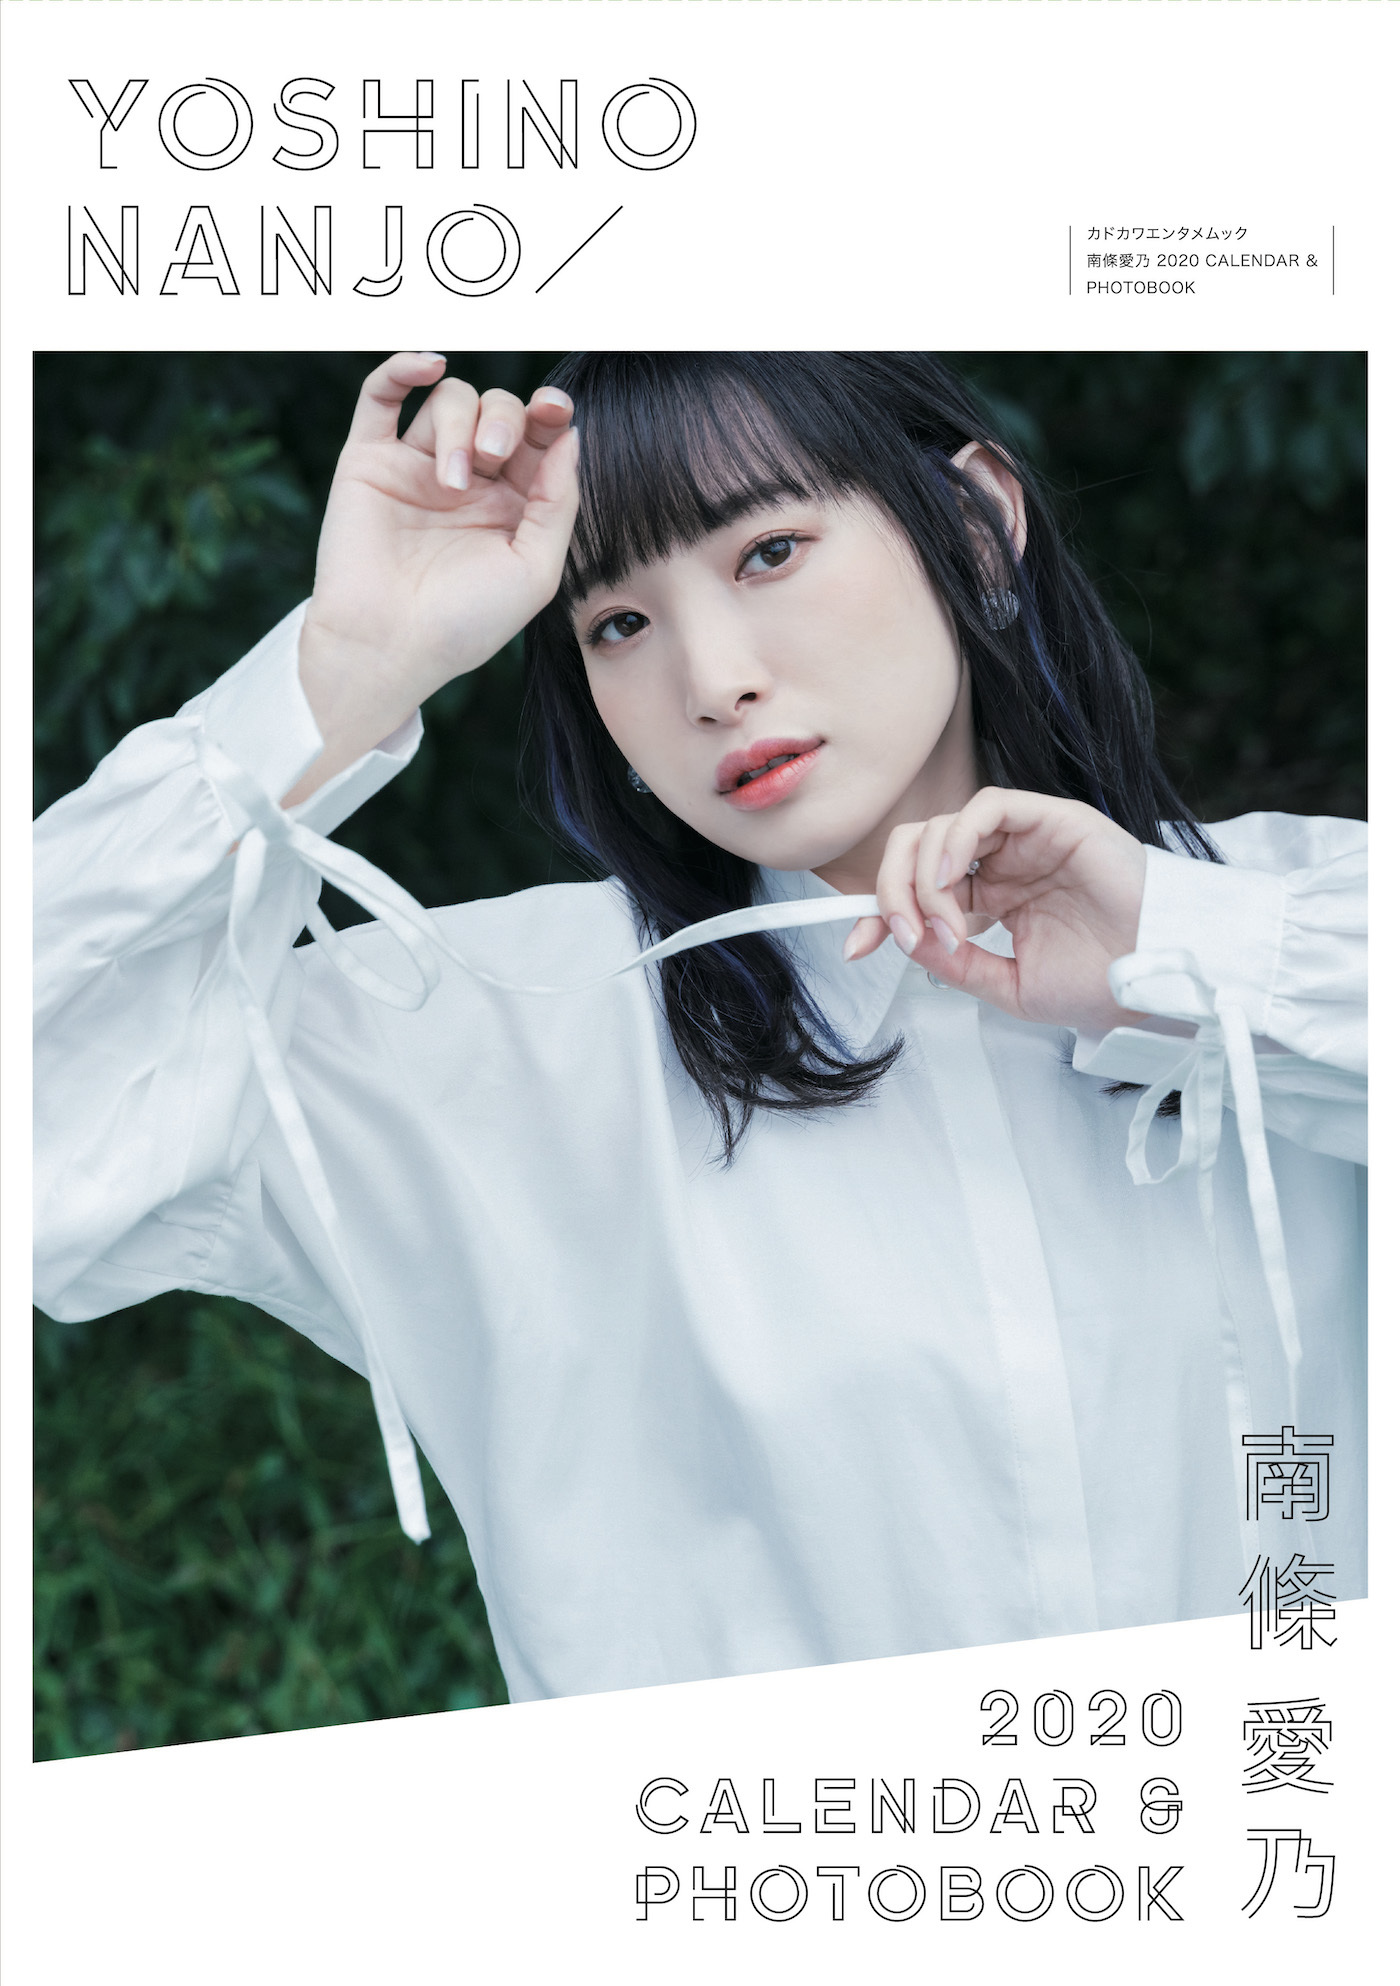 『南條愛乃 2020 CALENDAR & PHOTOBOOK』 Photo by 加藤アラタ